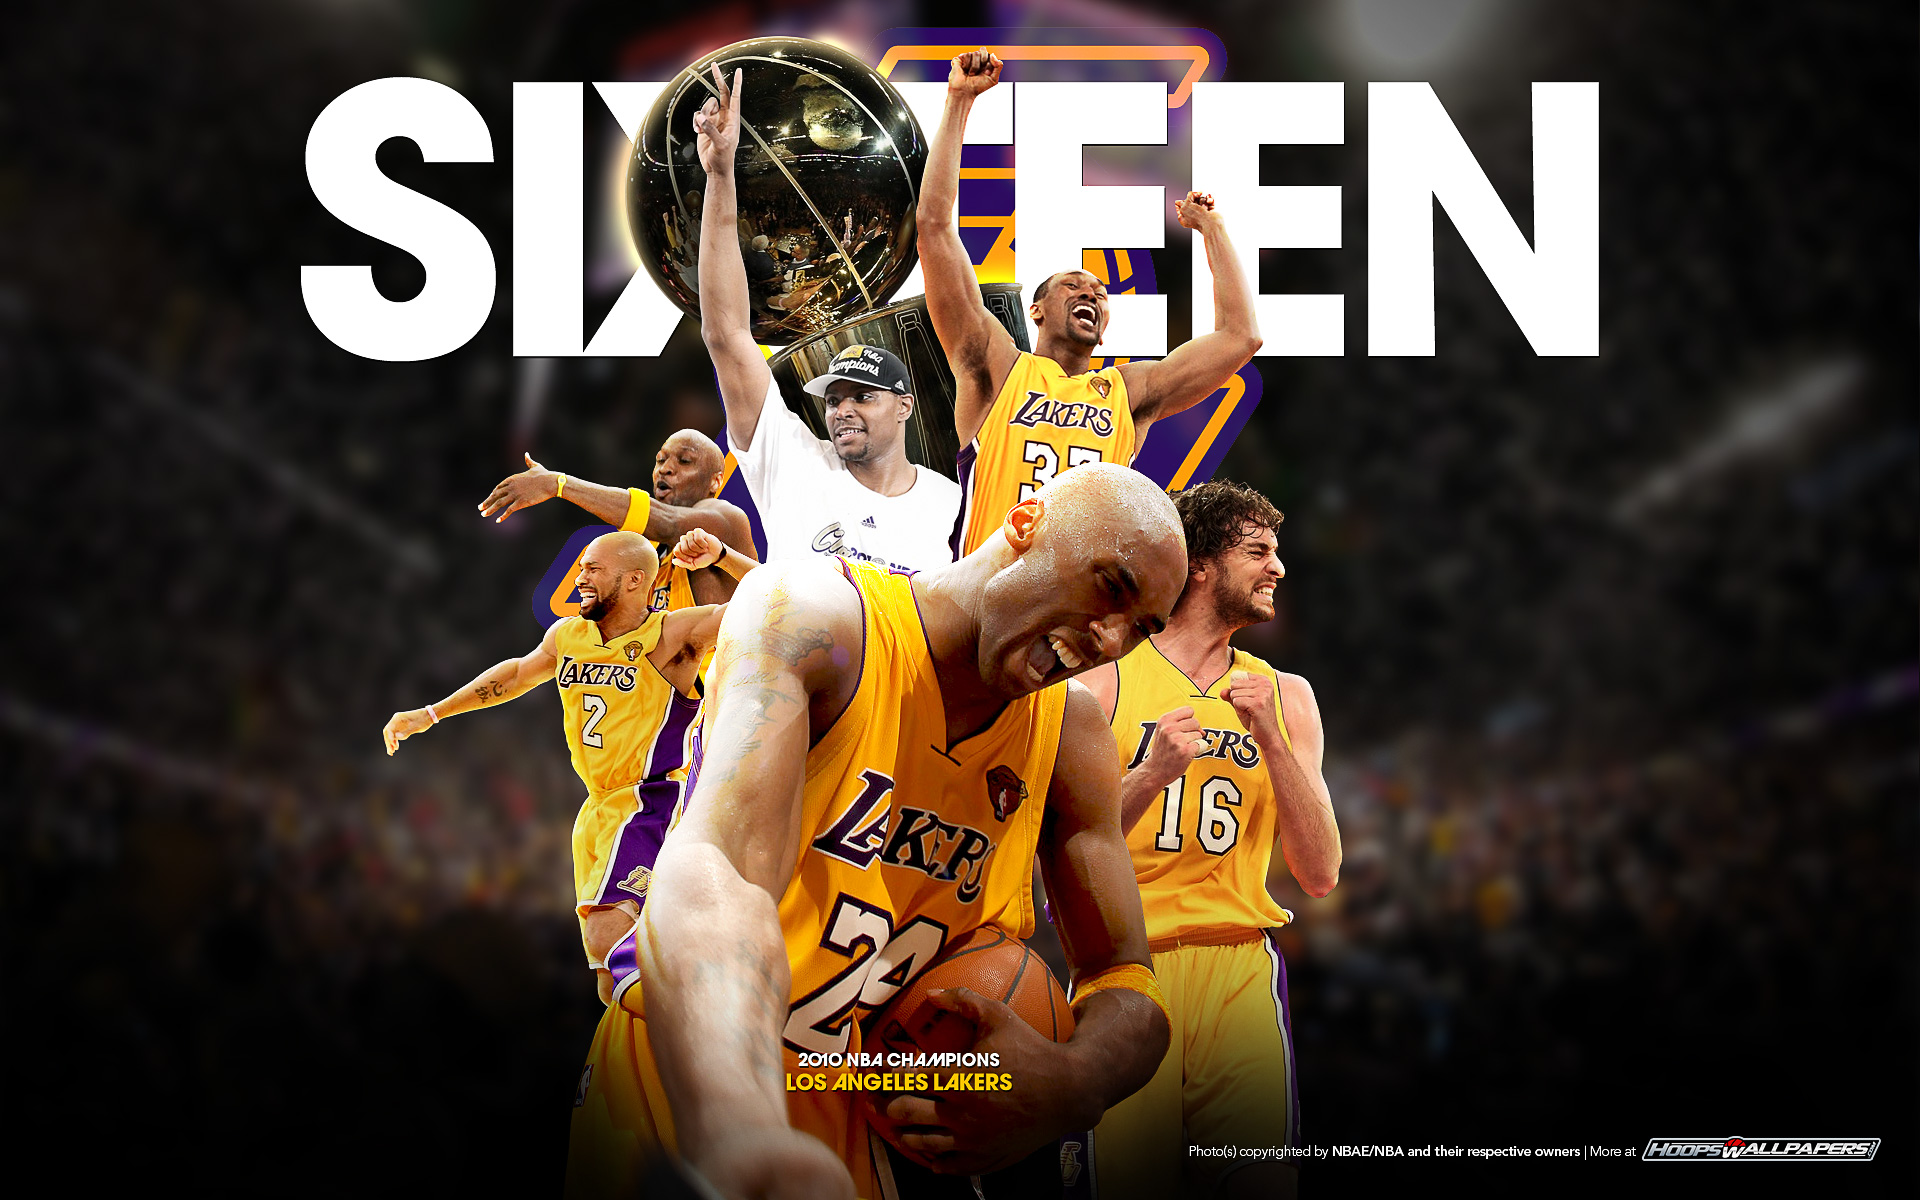 [76+] Lakers Championship Wallpaper on WallpaperSafari